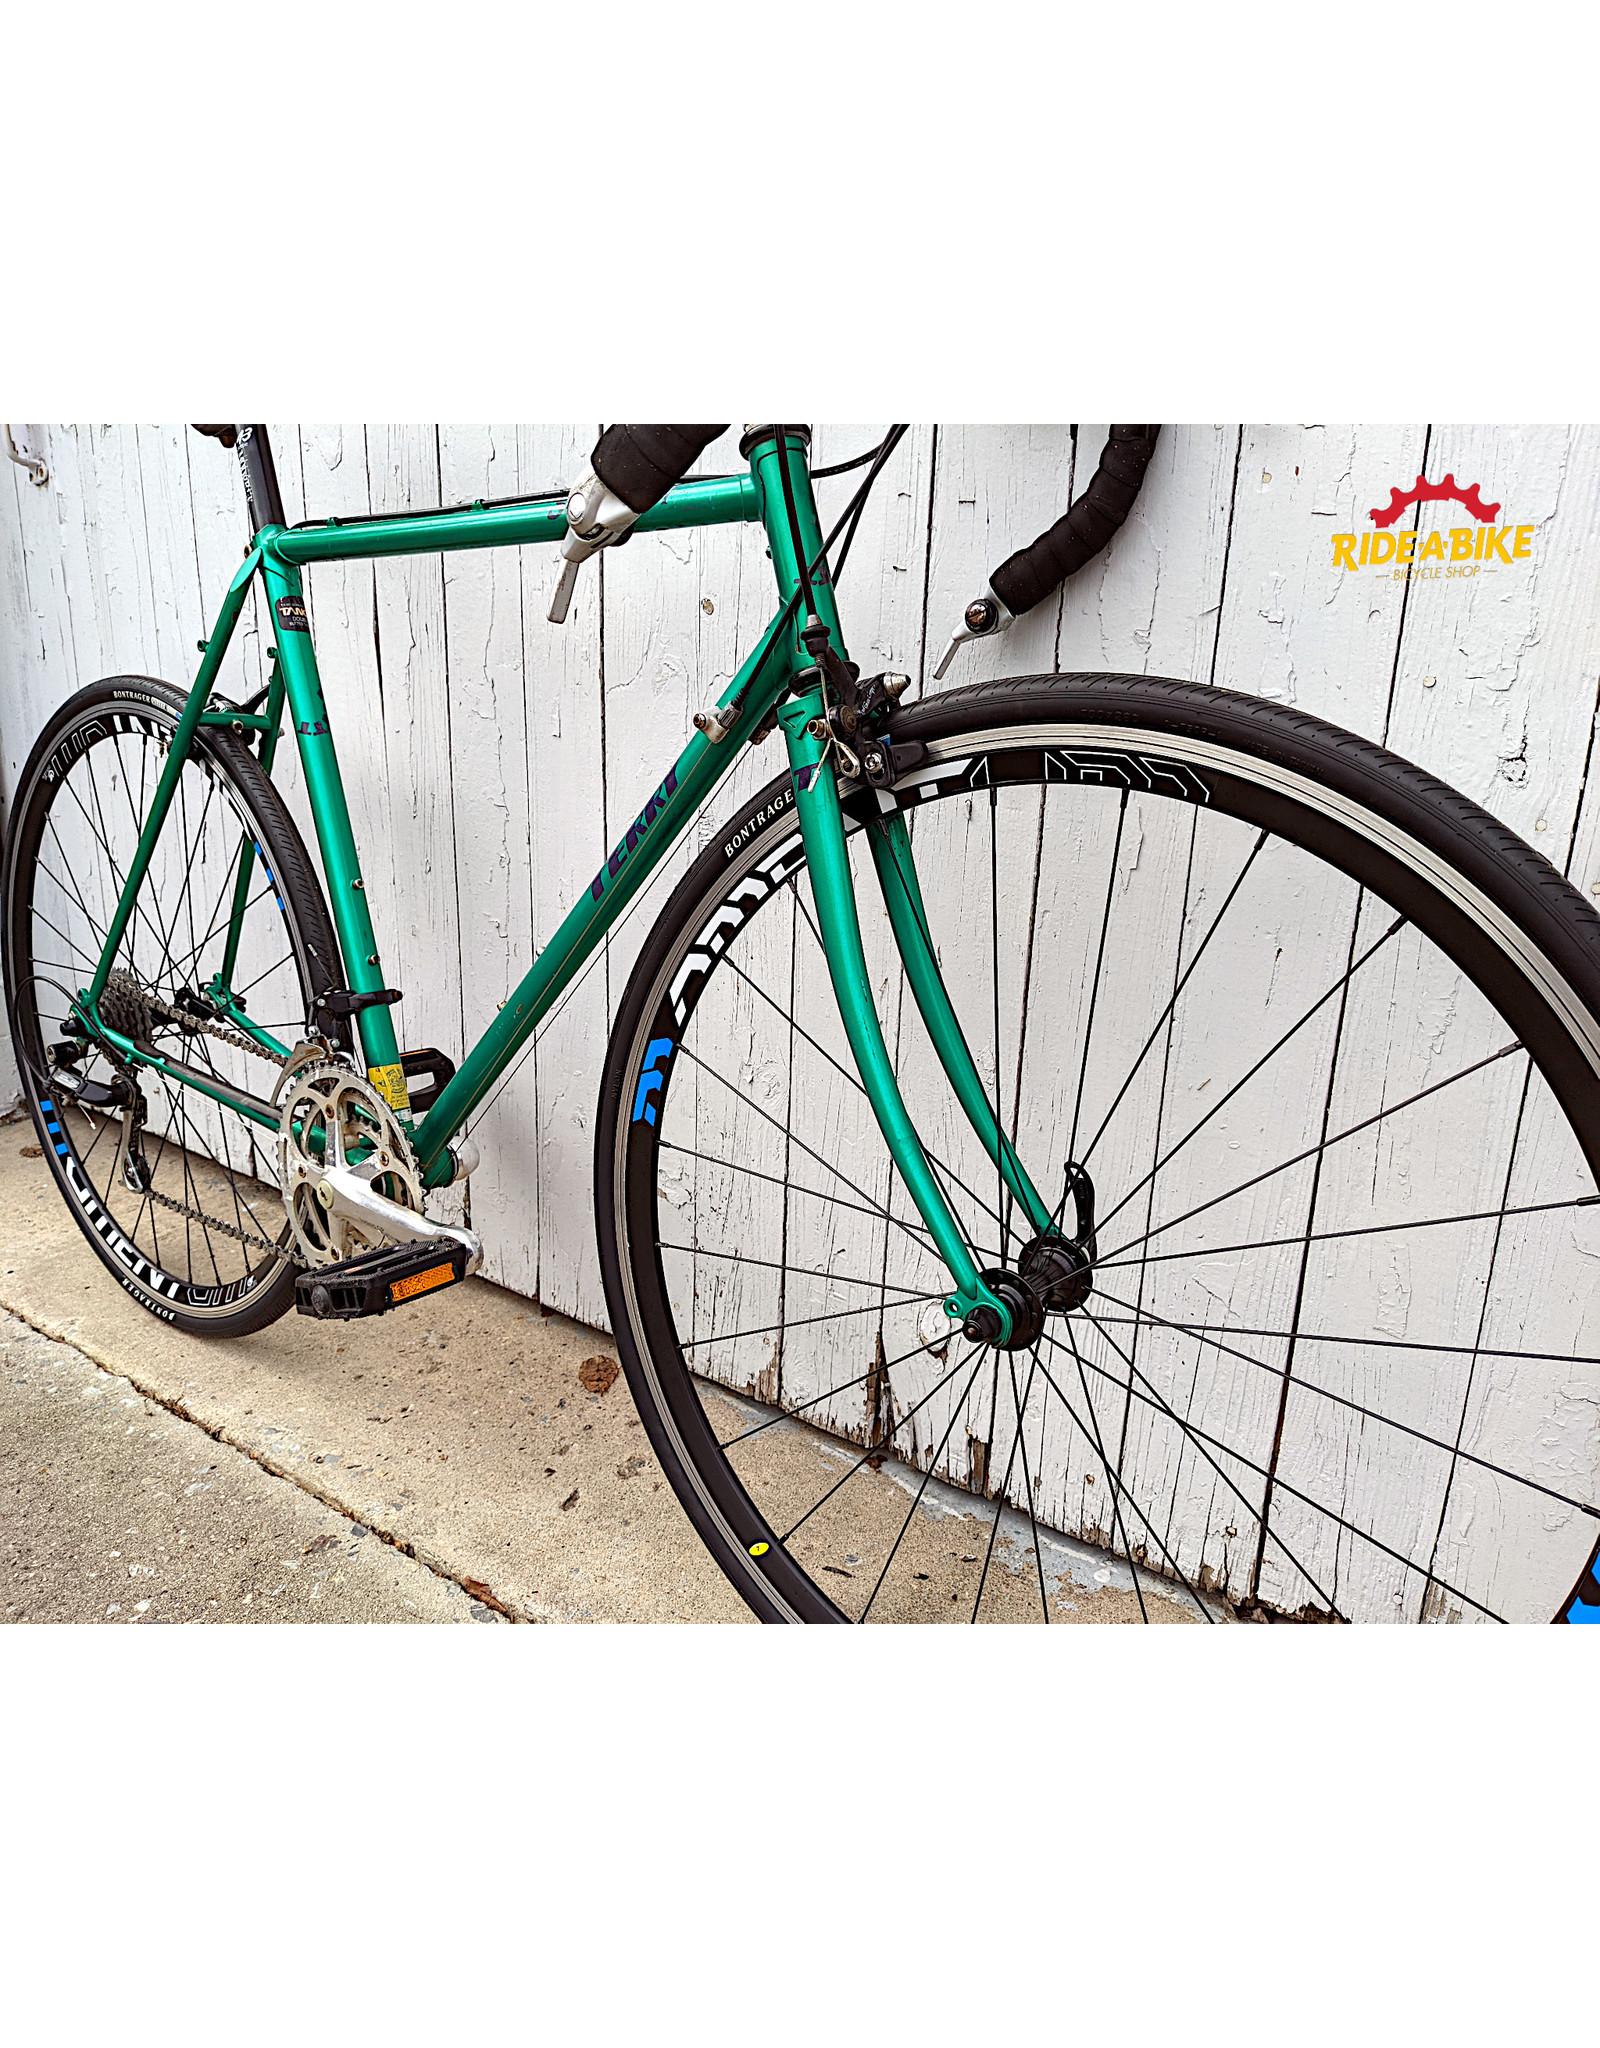 Terry Georgena 55cm Road Bike (Used)